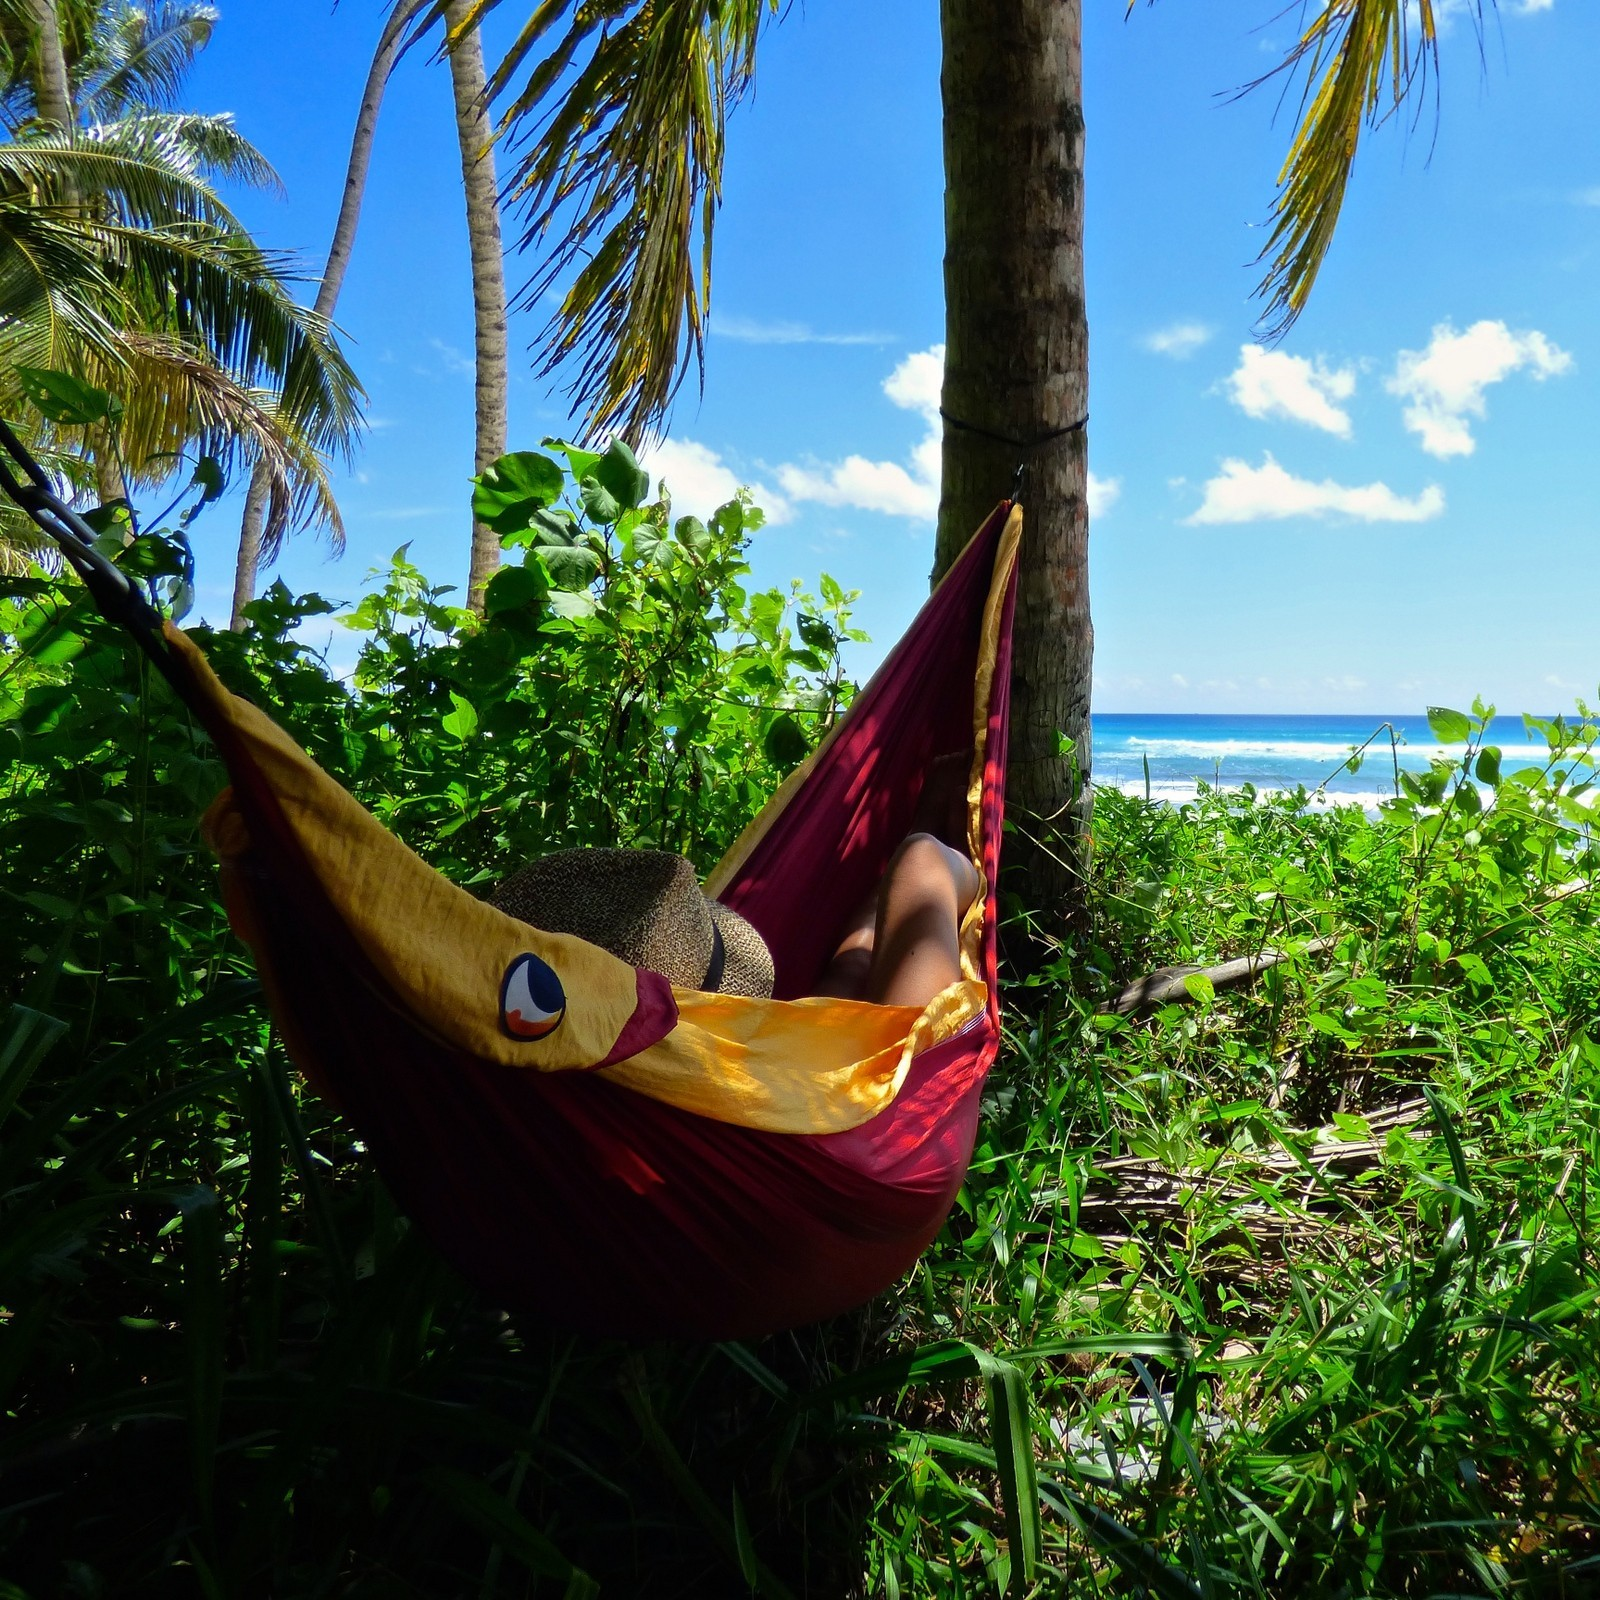 Гамак висит под пальмами.